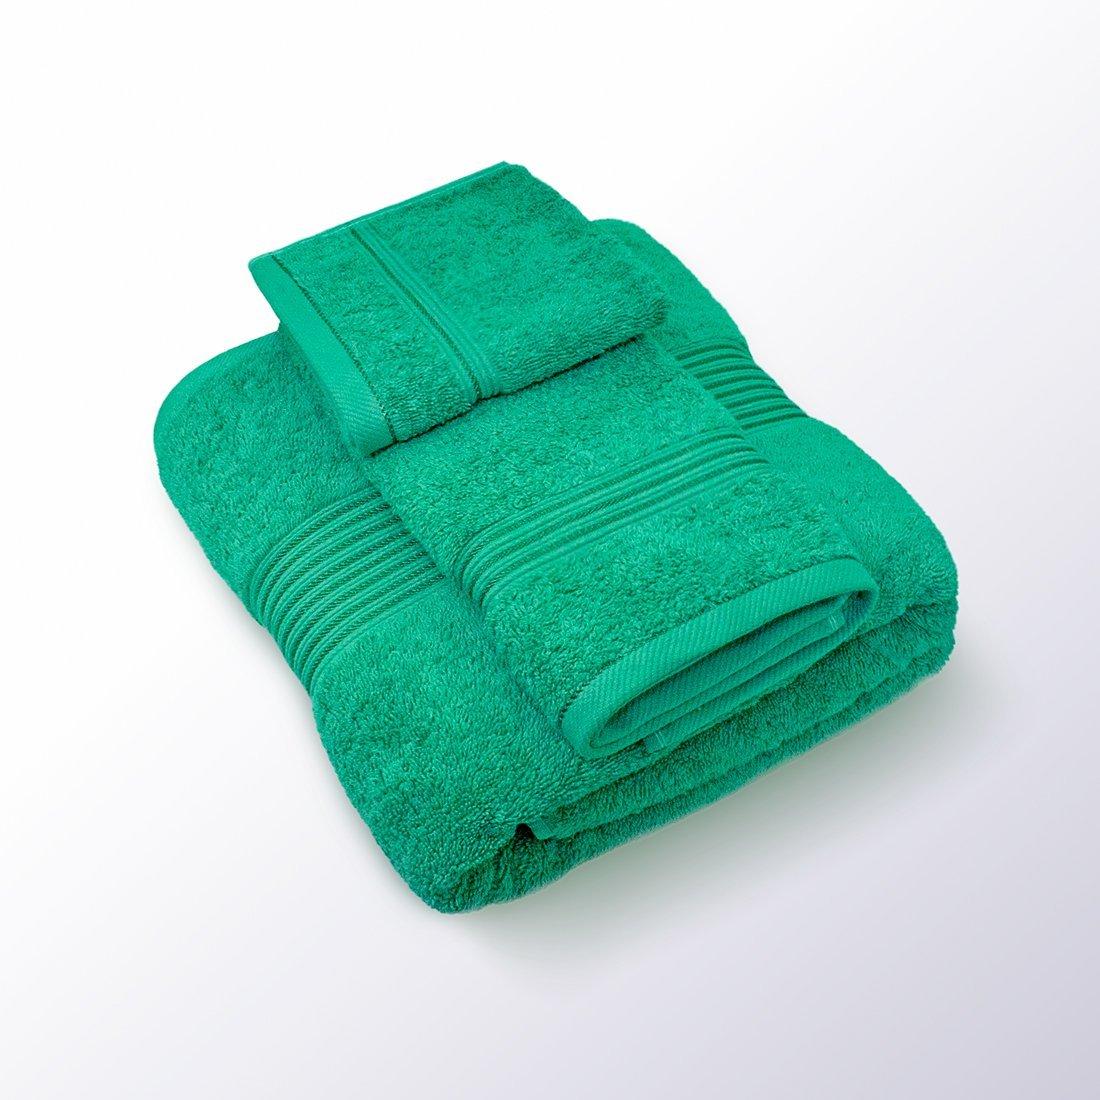 Swiss Republic 100% Cotton Fade Resistant Large towel set, 1 Extra Large Bath towel (Bath Sheet) 35x70, 1 Hand Towel 16x28, 1 Face Towel 12x12, Machine Washable, Soft, Absorbent